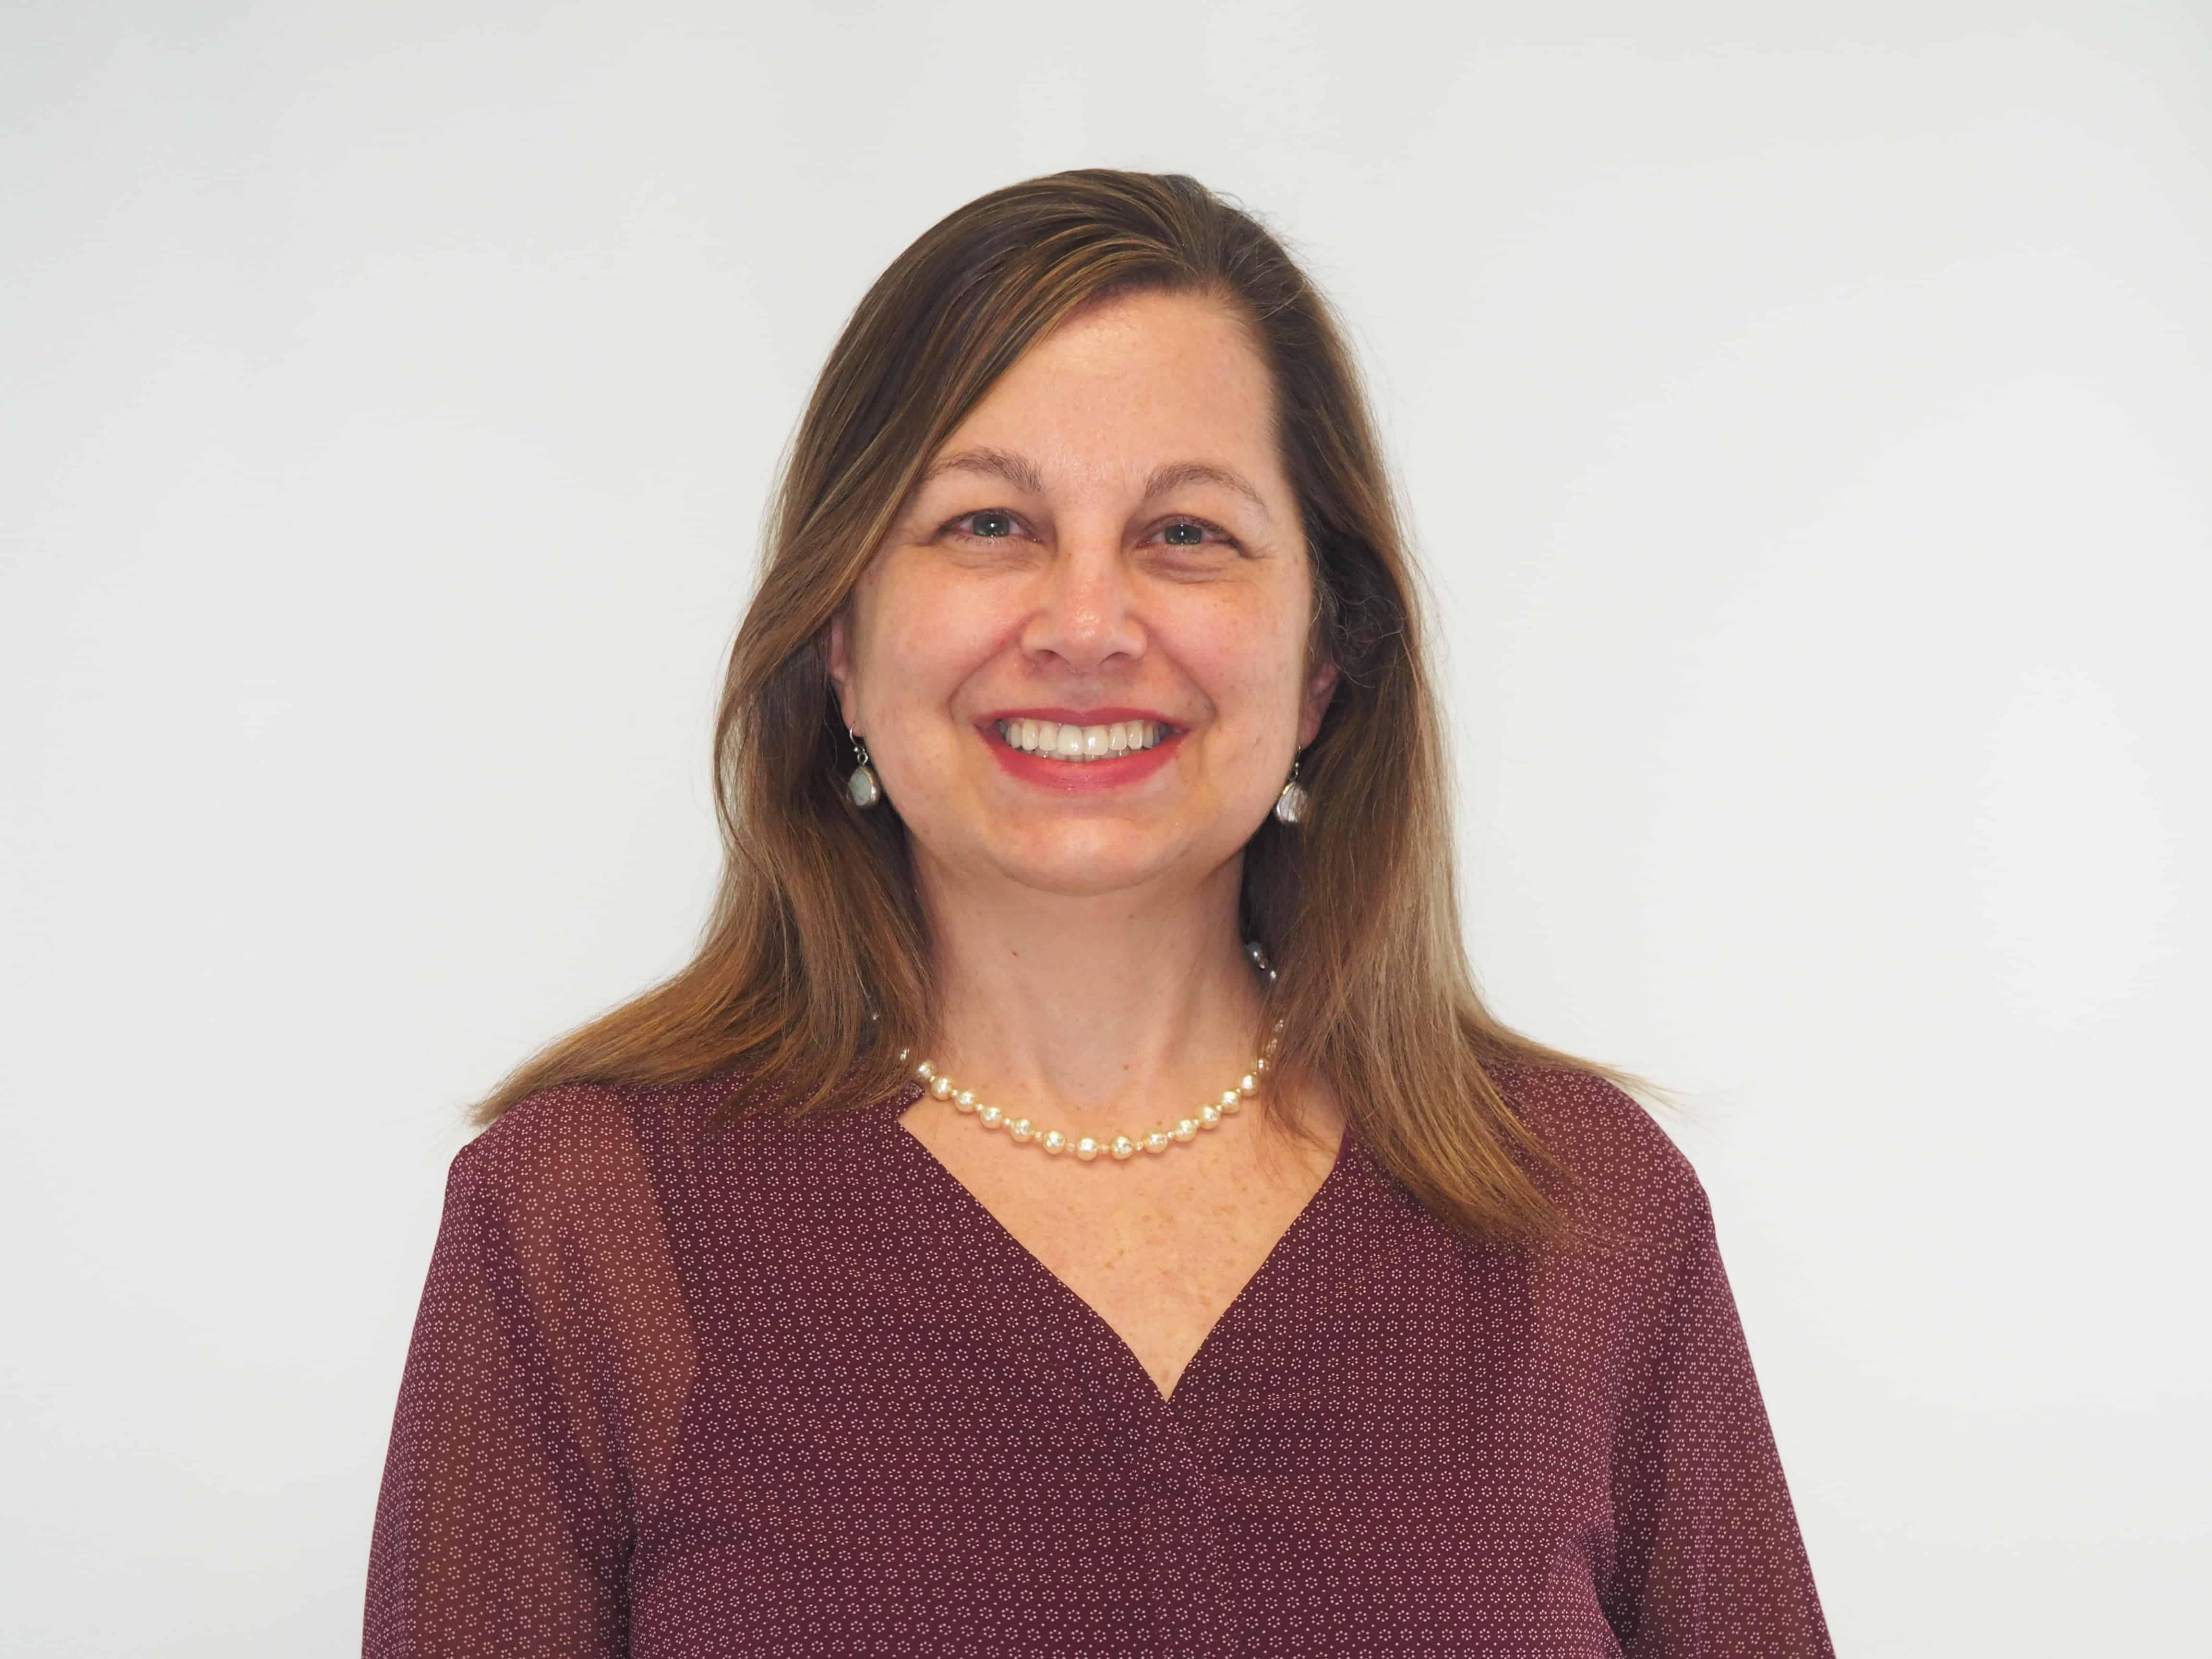 Susan Donoghue, Controller